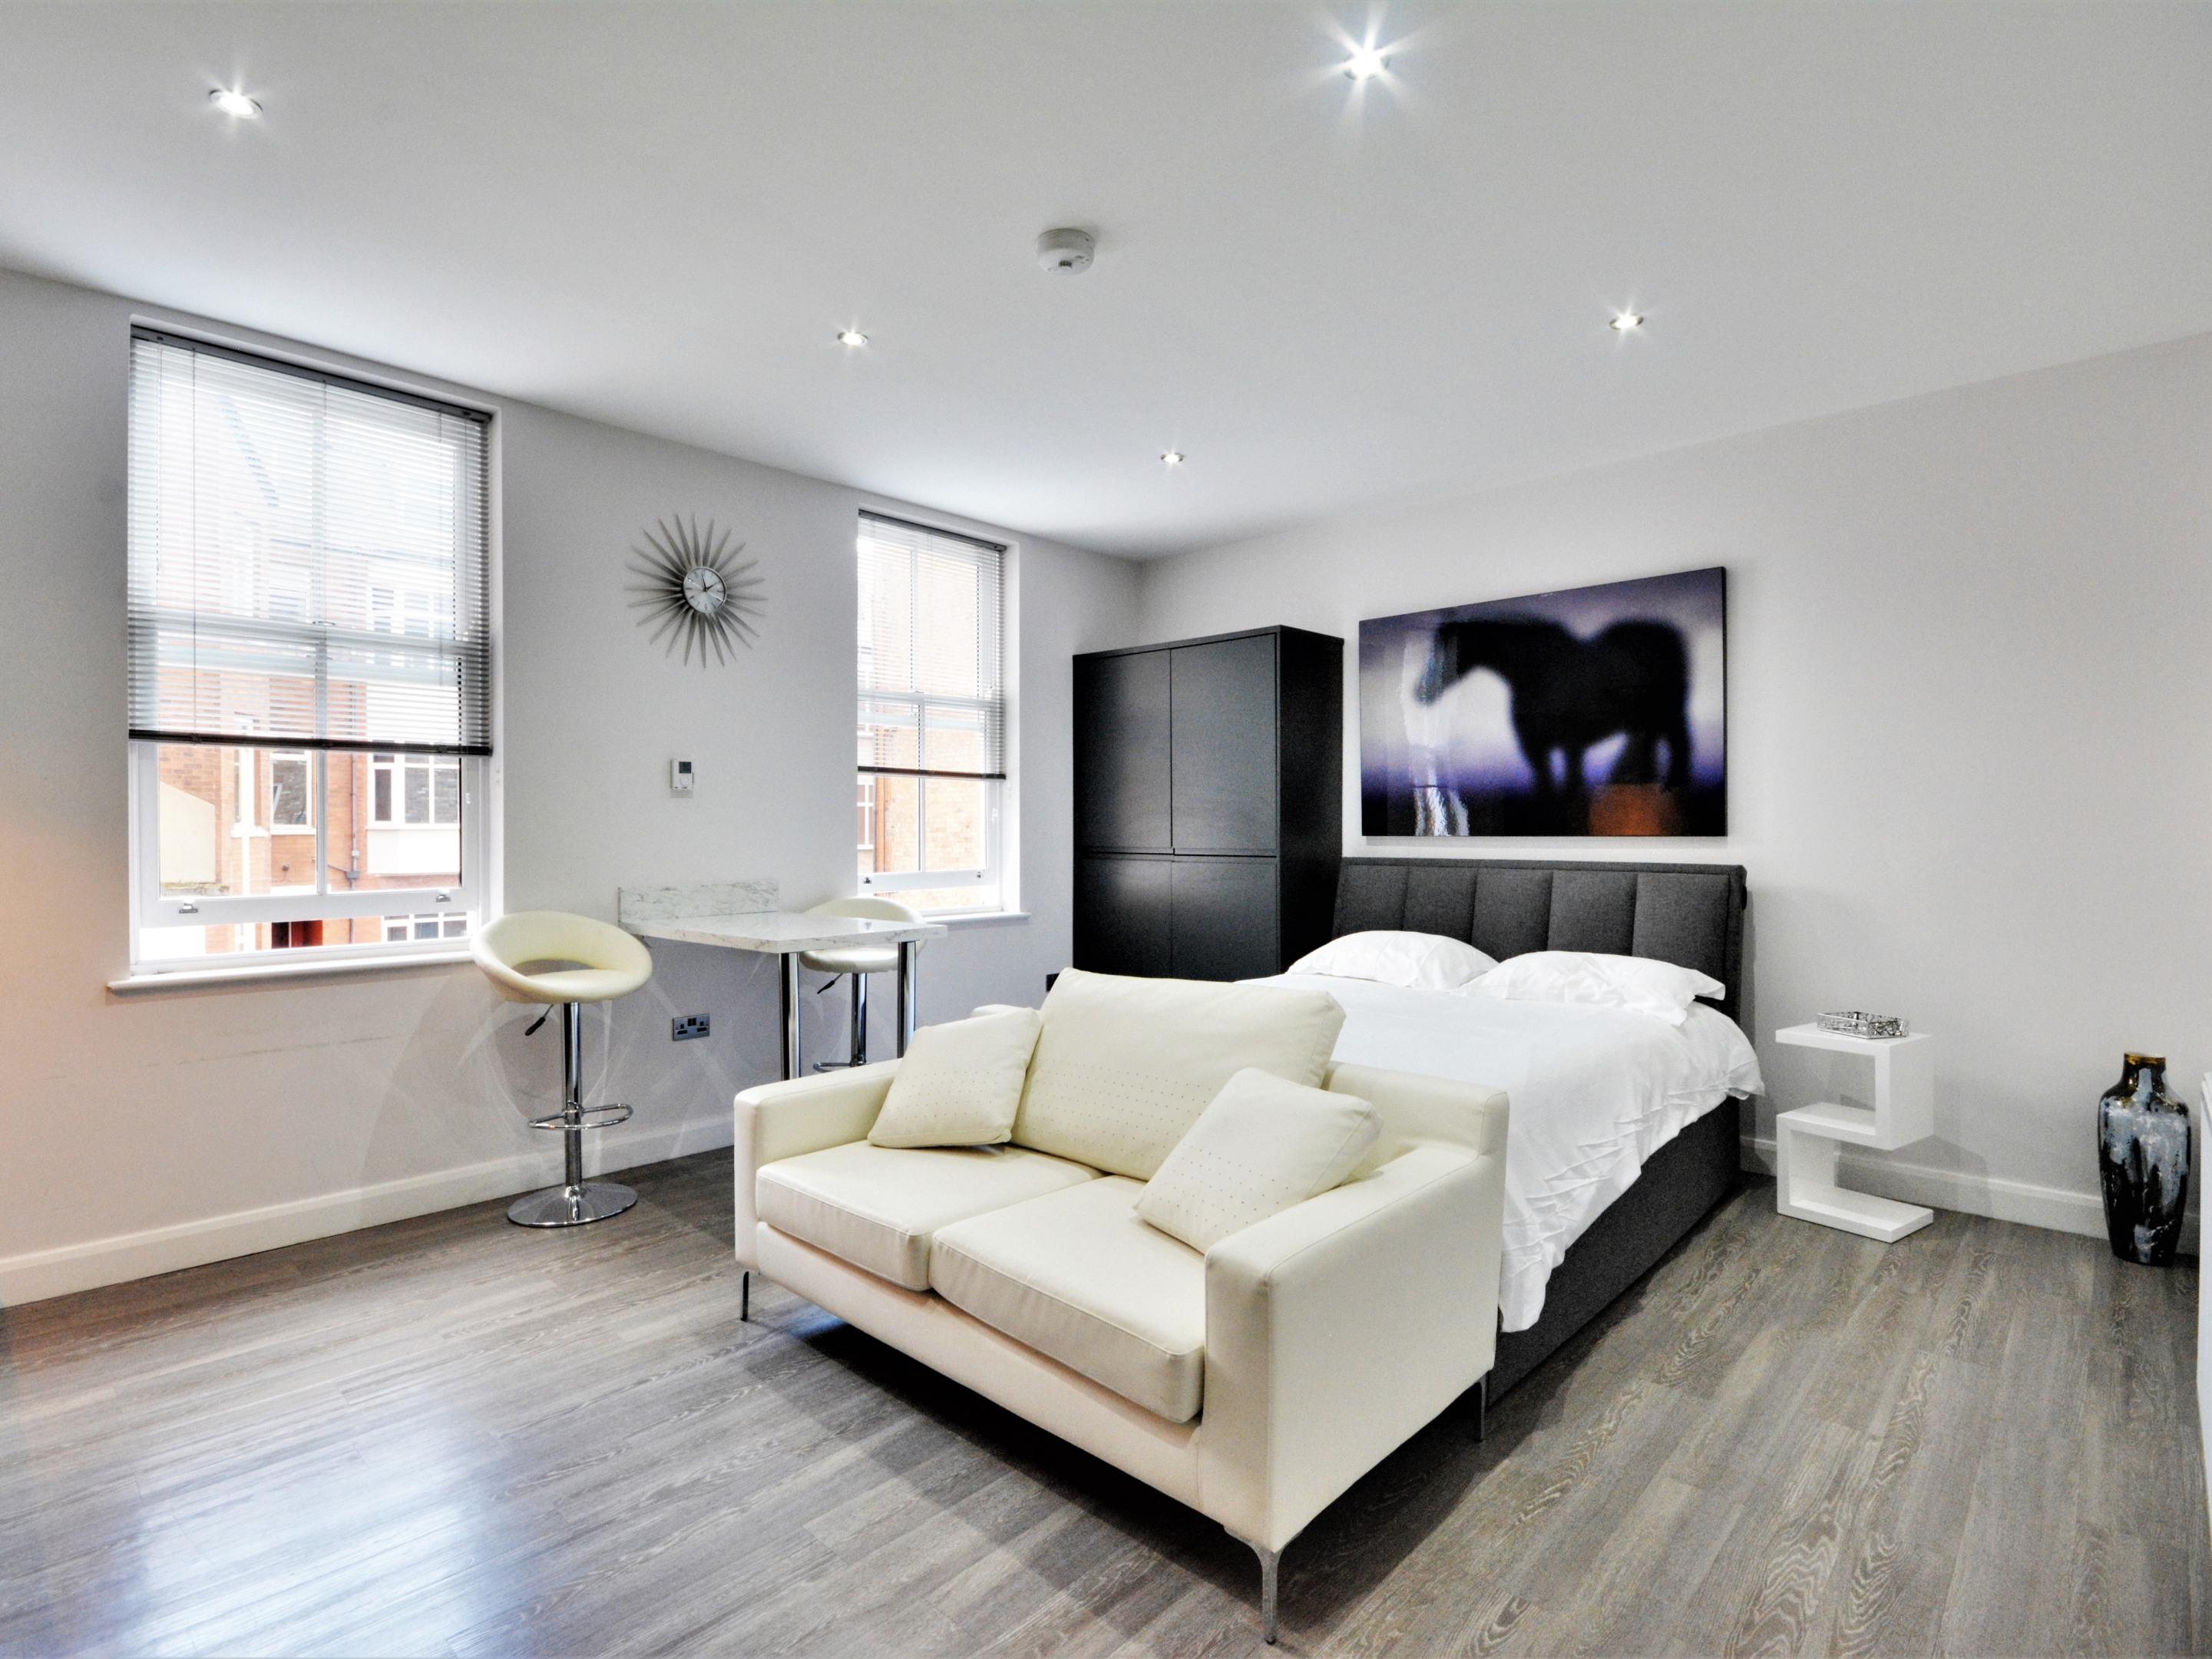 Studio-Premium-Ensuite with Shower-Street View-Studio apartment / - Base Rate